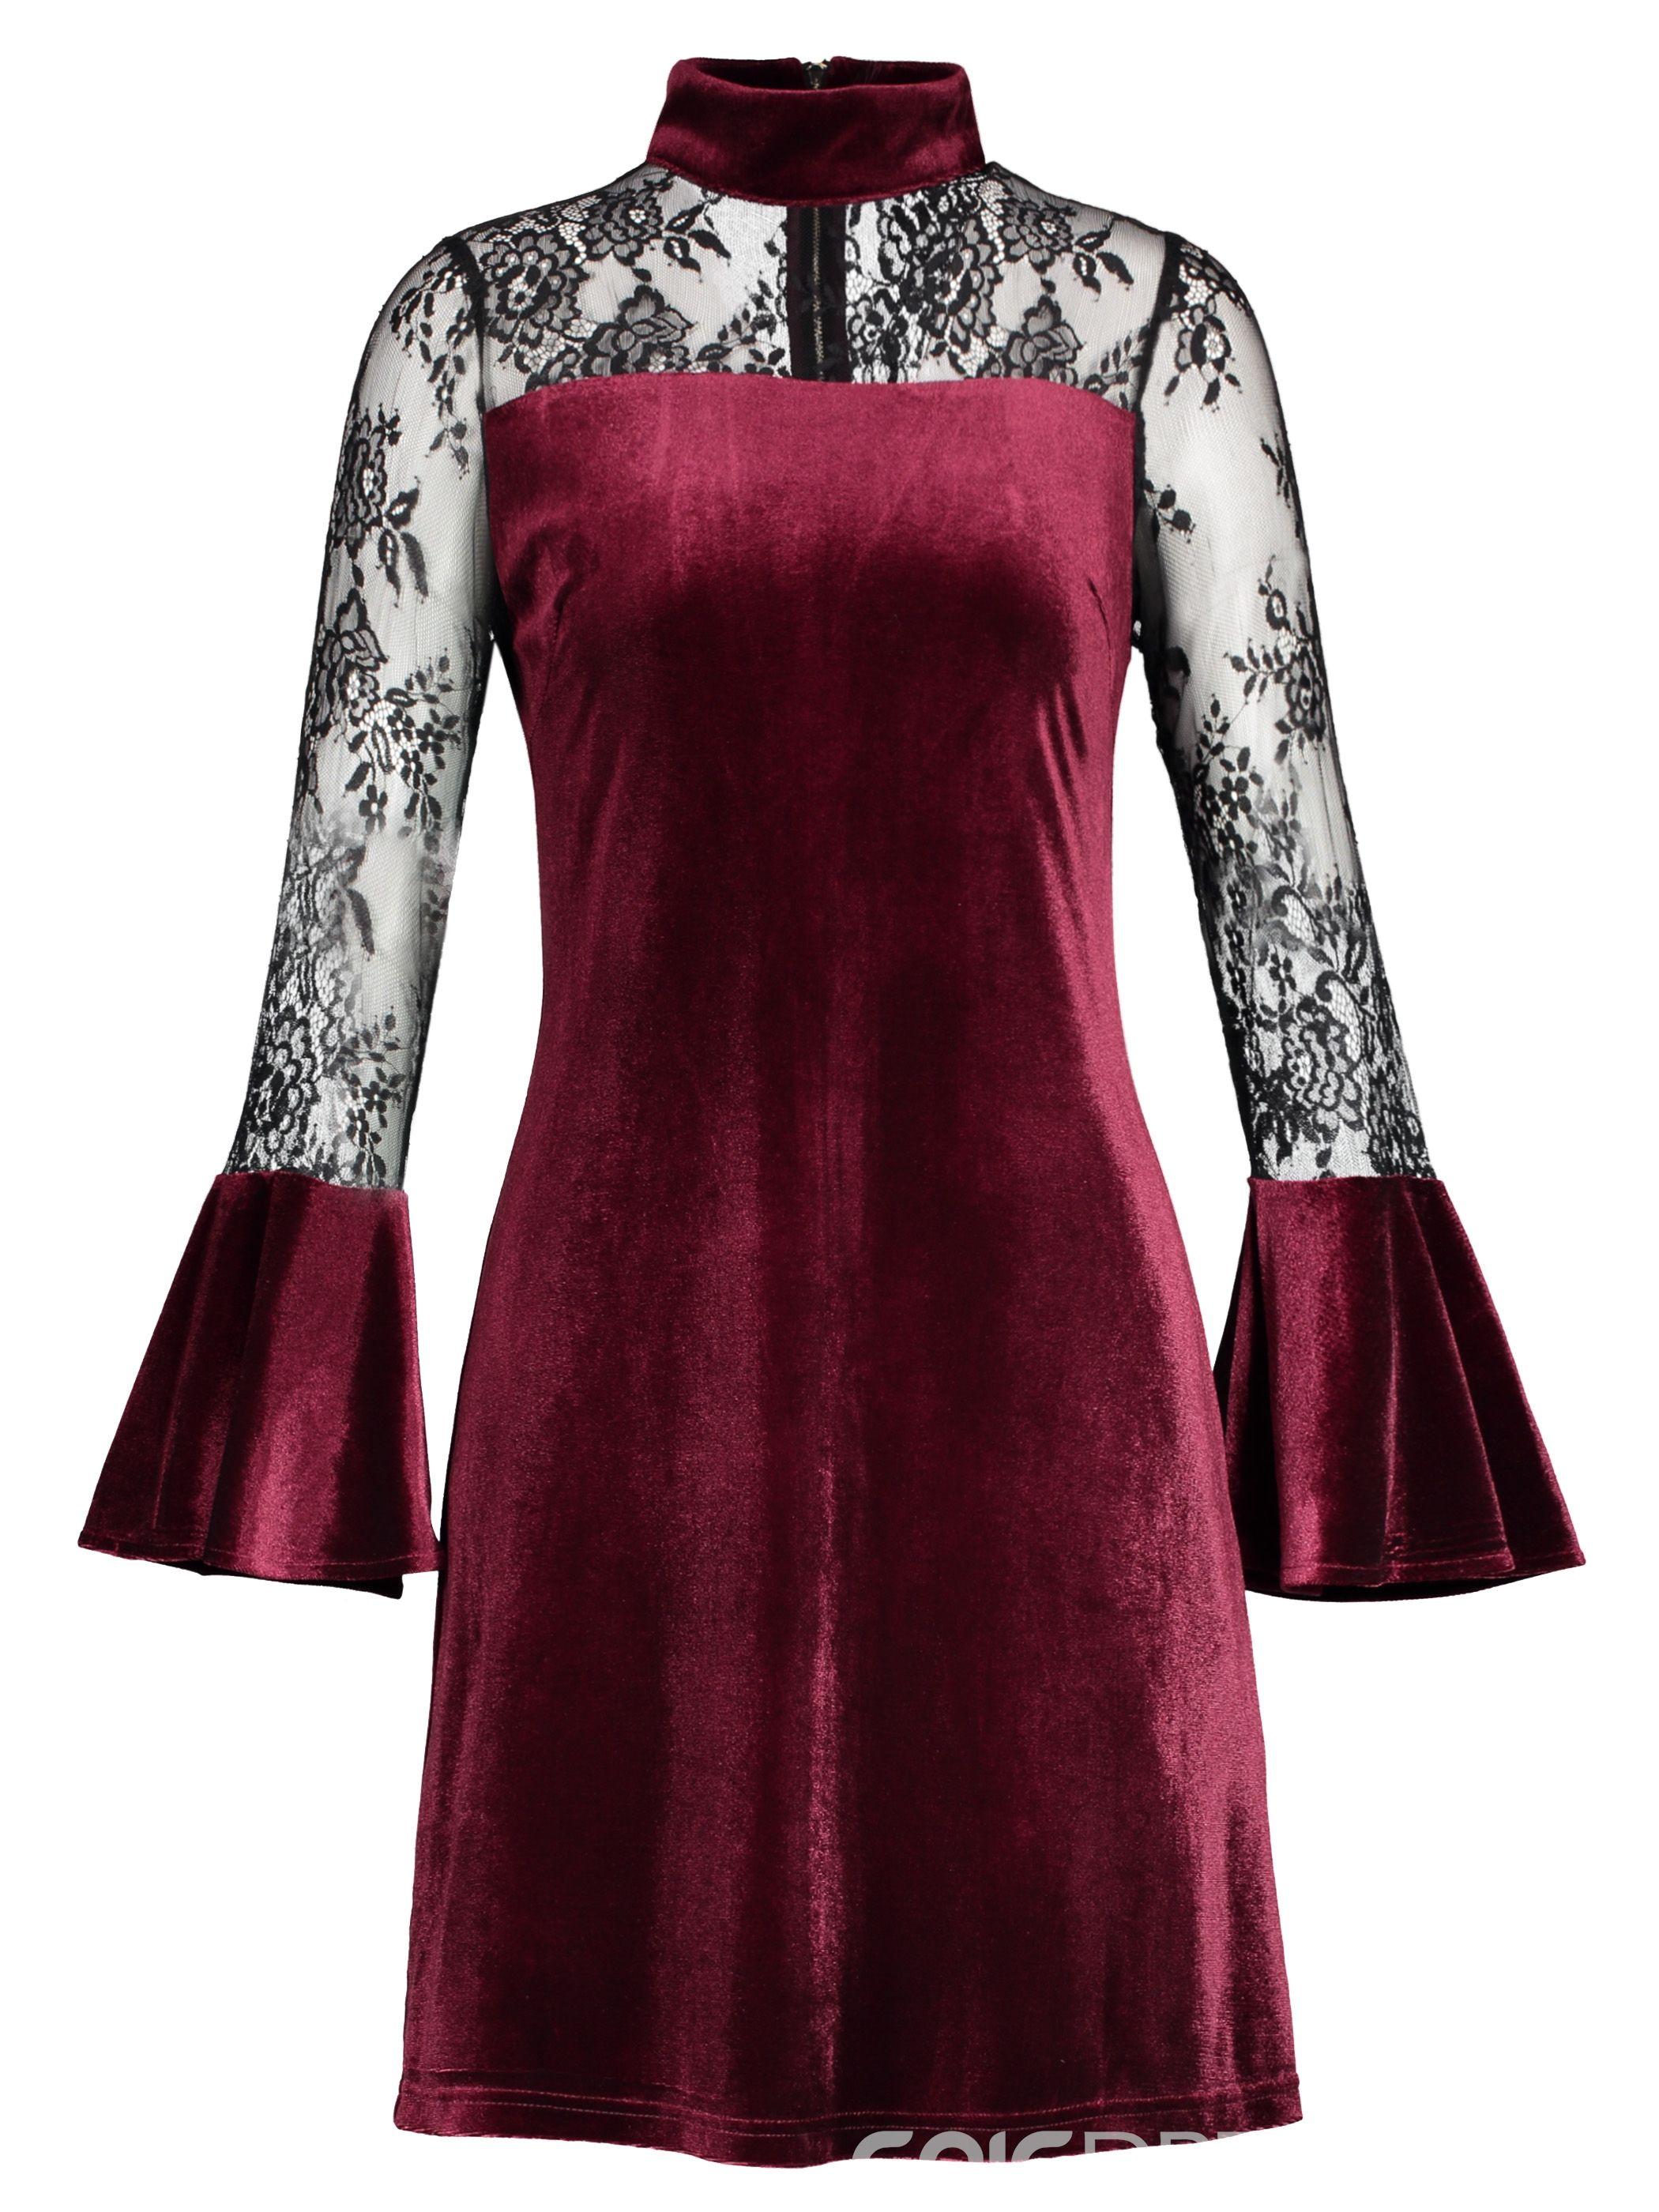 6e2b7efda04 Rosetic Gothic Skater Dress Lace Mesh Girl Summer Party Travel Fashion Slim  Sexy Bella Morte Maiden ...